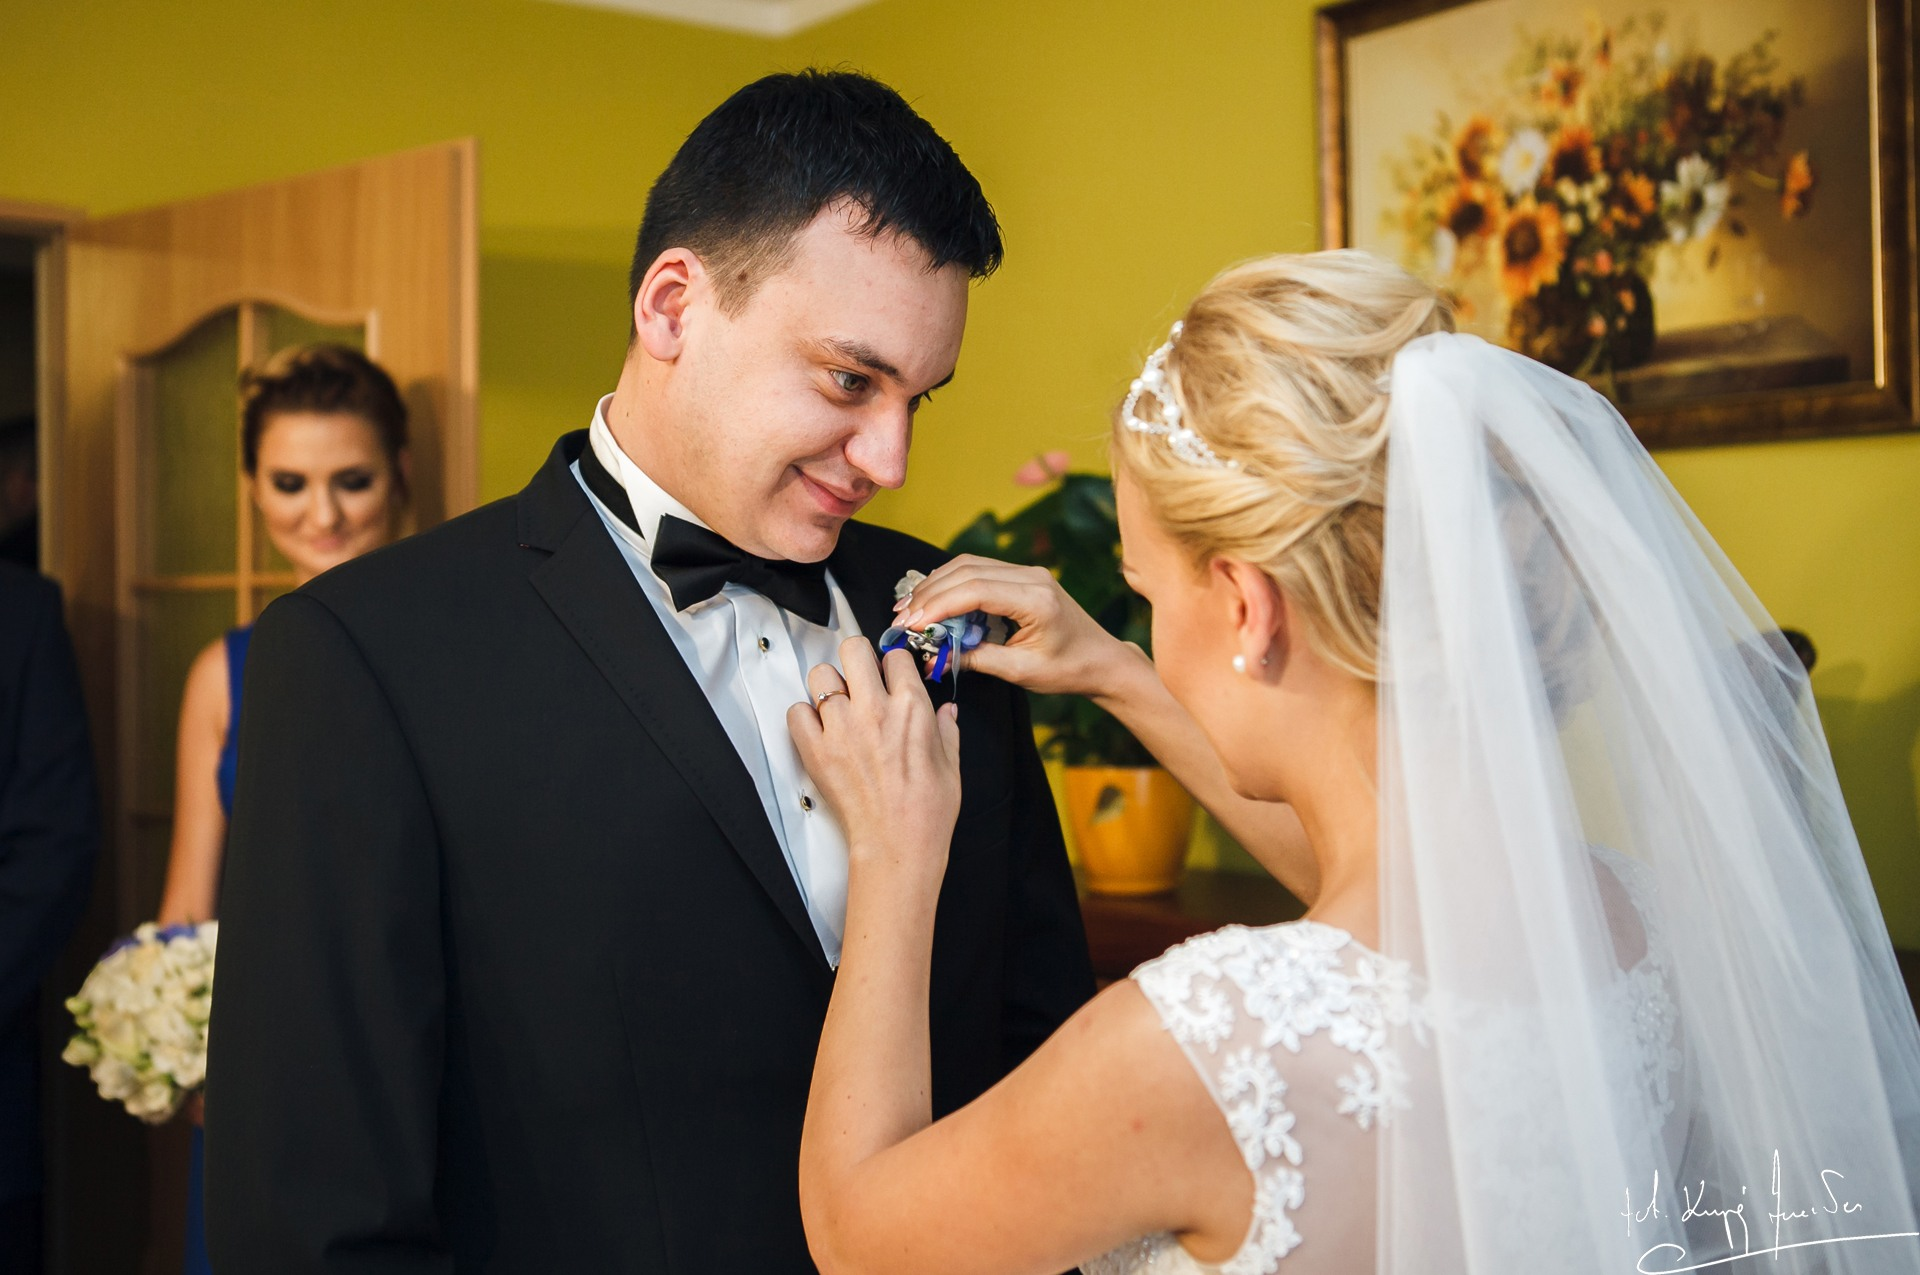 Jawor 33 Lidia & Piotr